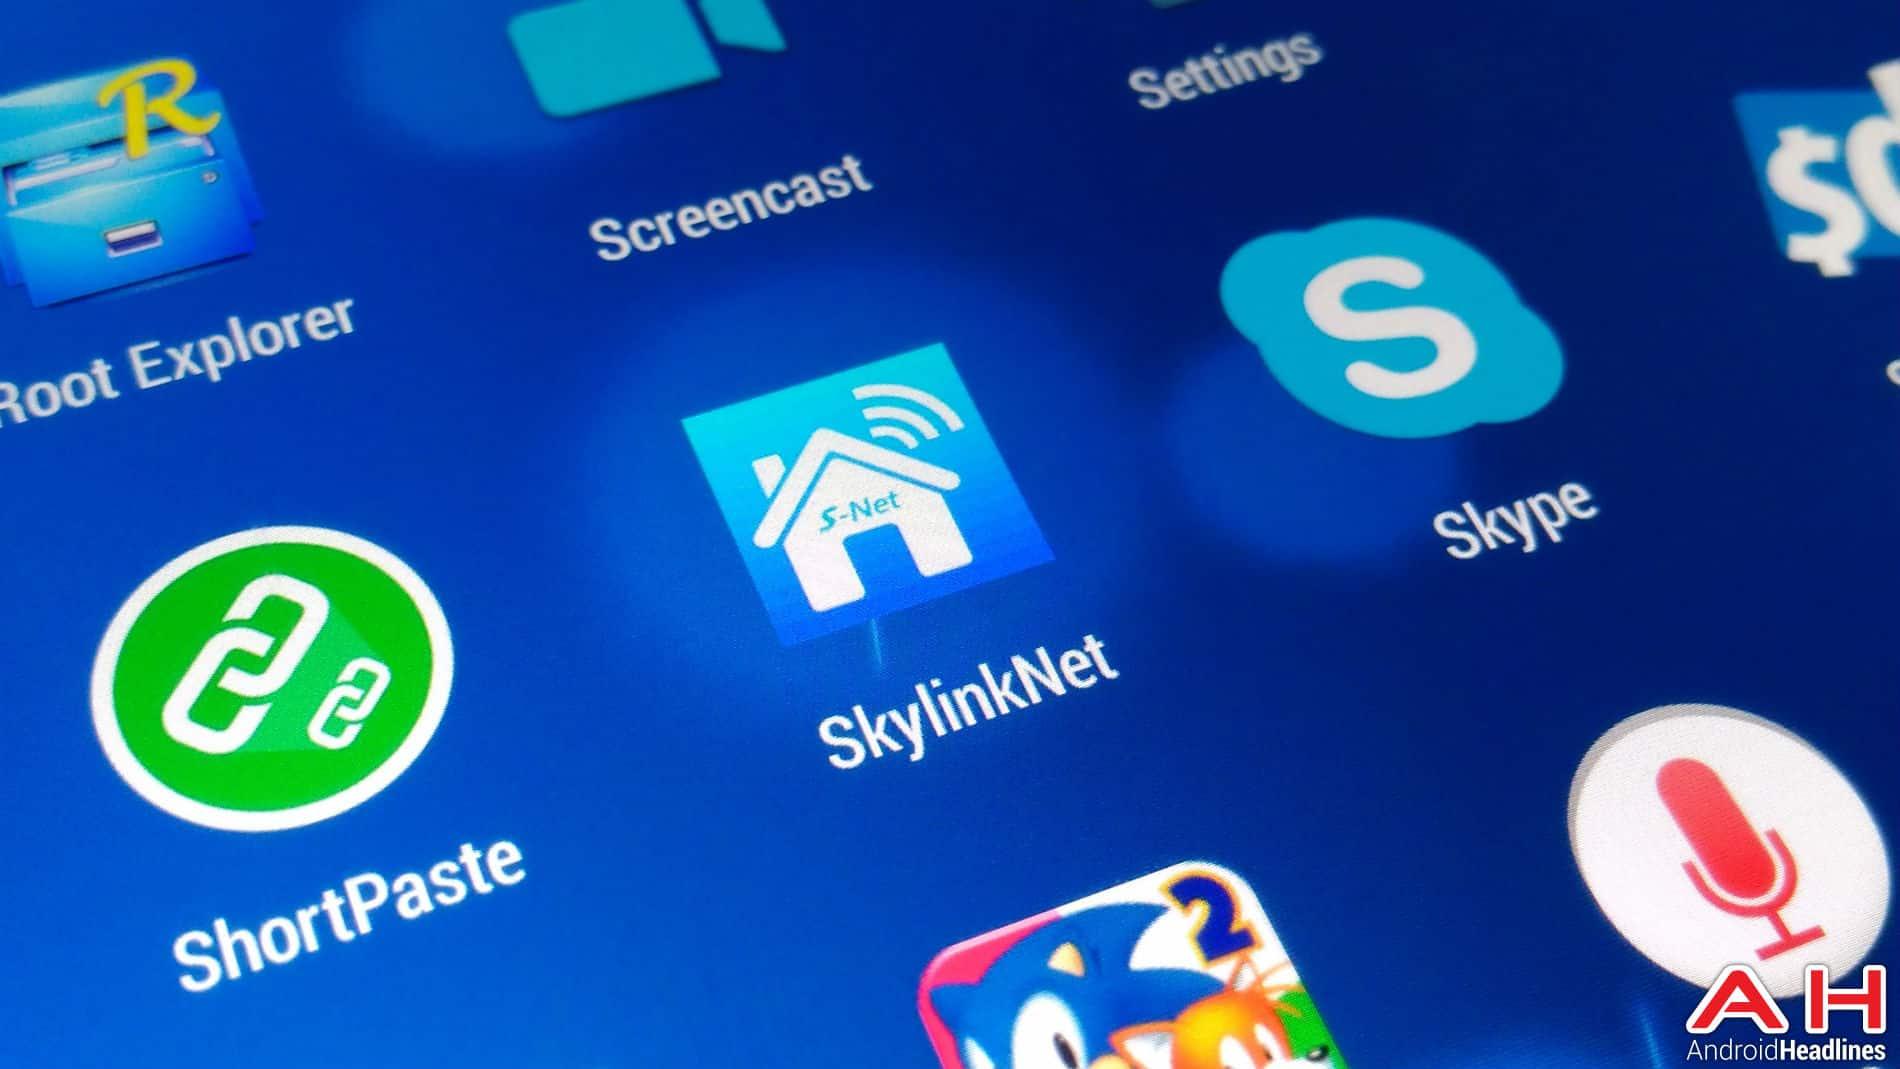 Skylink Net App AH